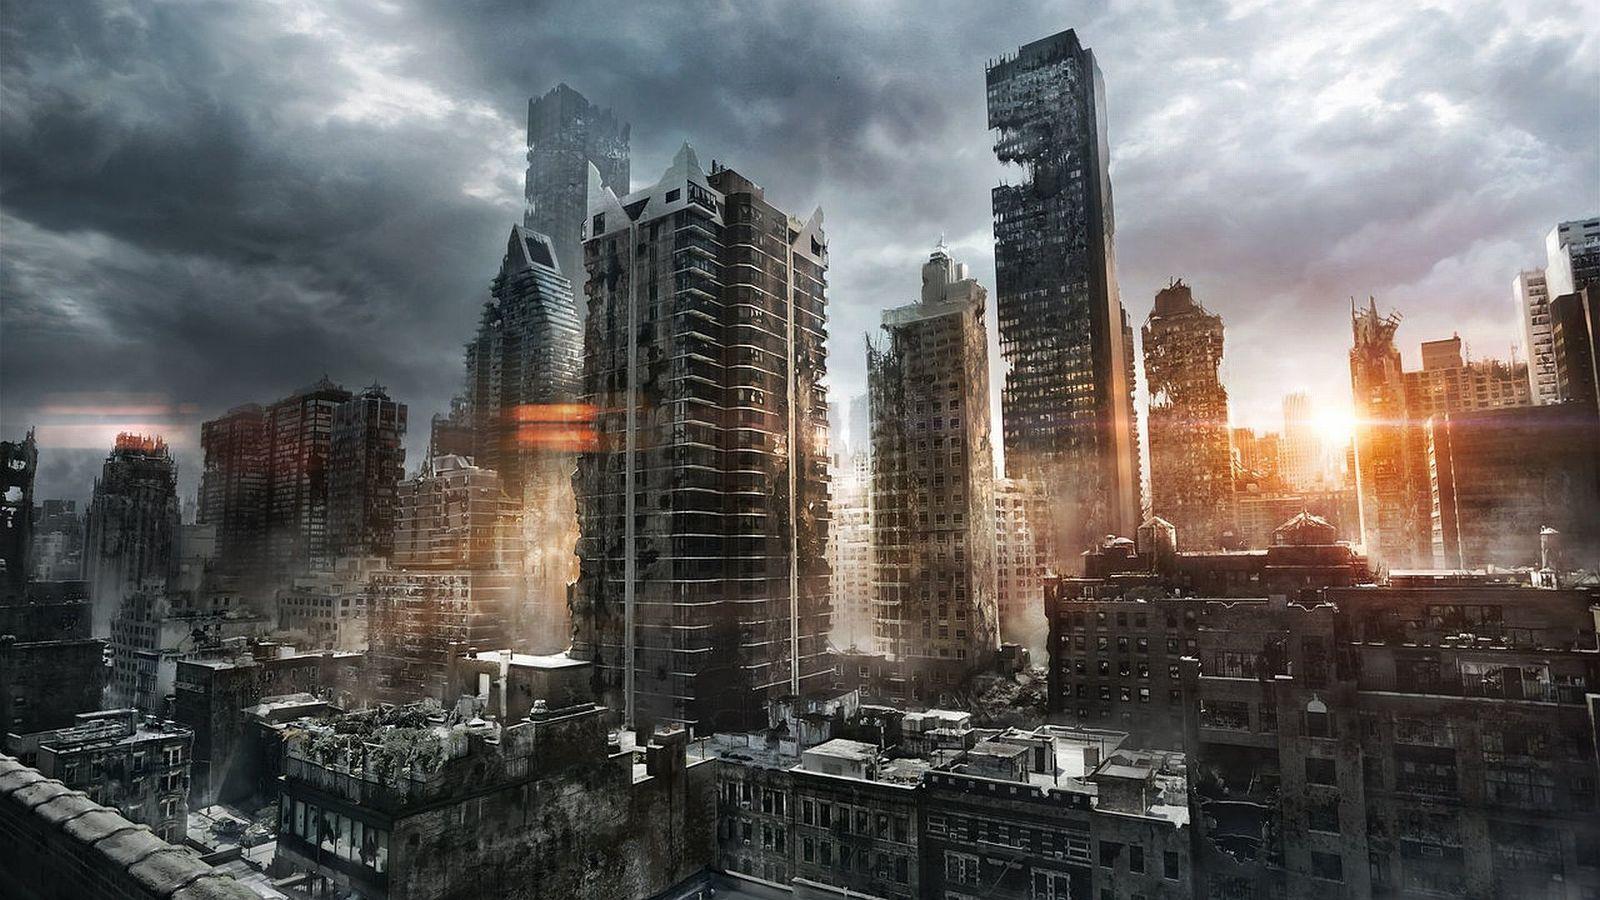 Les ruines du monde